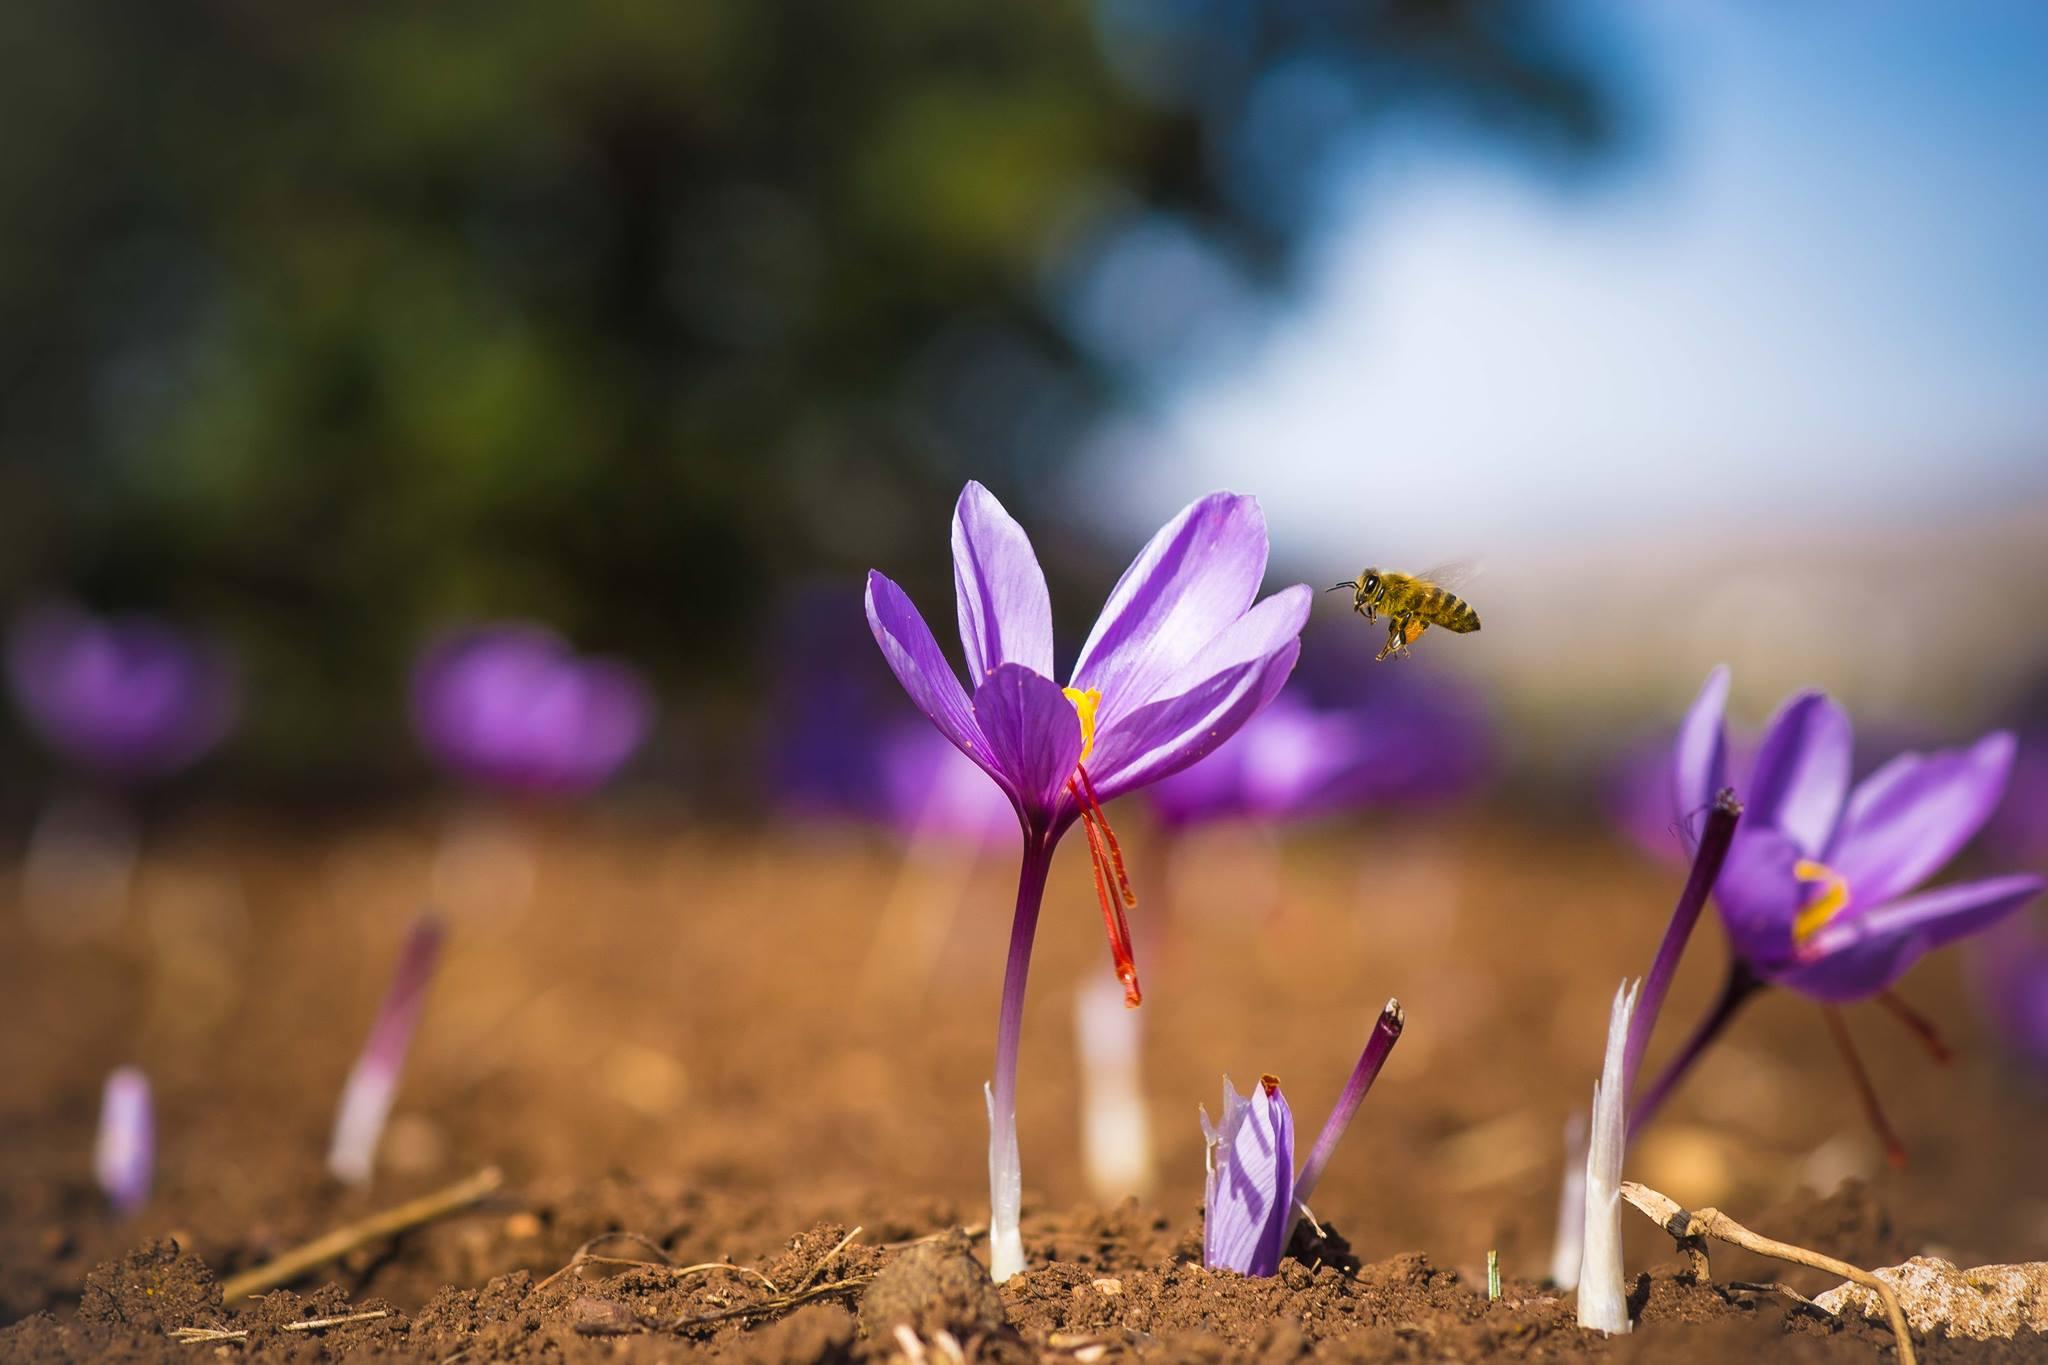 kozan.gr: Σημερινές φωτογραφίες, με το «χρυσάφι της ελληνικής γης», από κροκοχώραφα του δήμου Κοζάνης